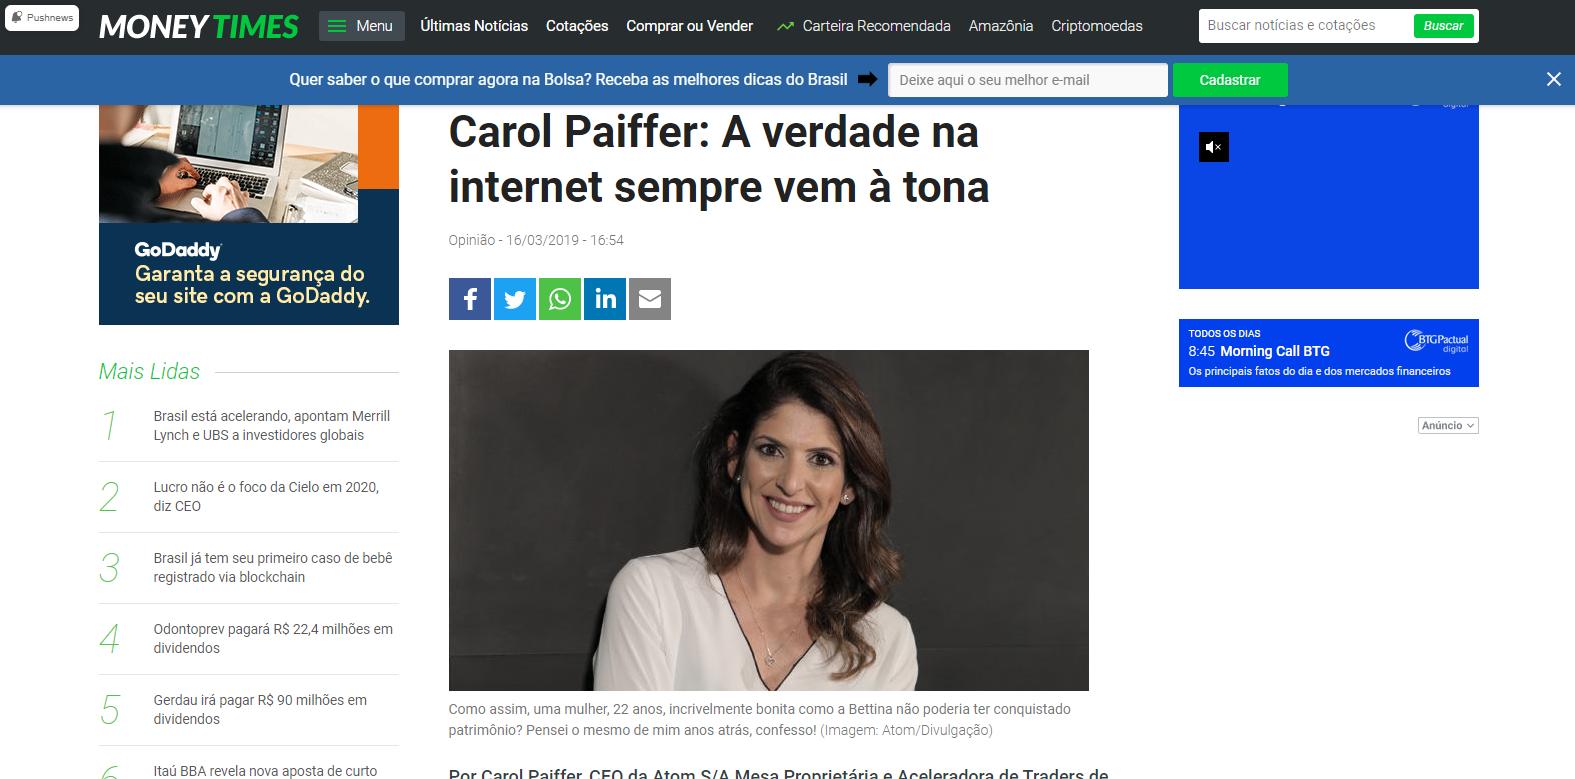 Carol Paiffer: A verdade na internet sempre vem à tona